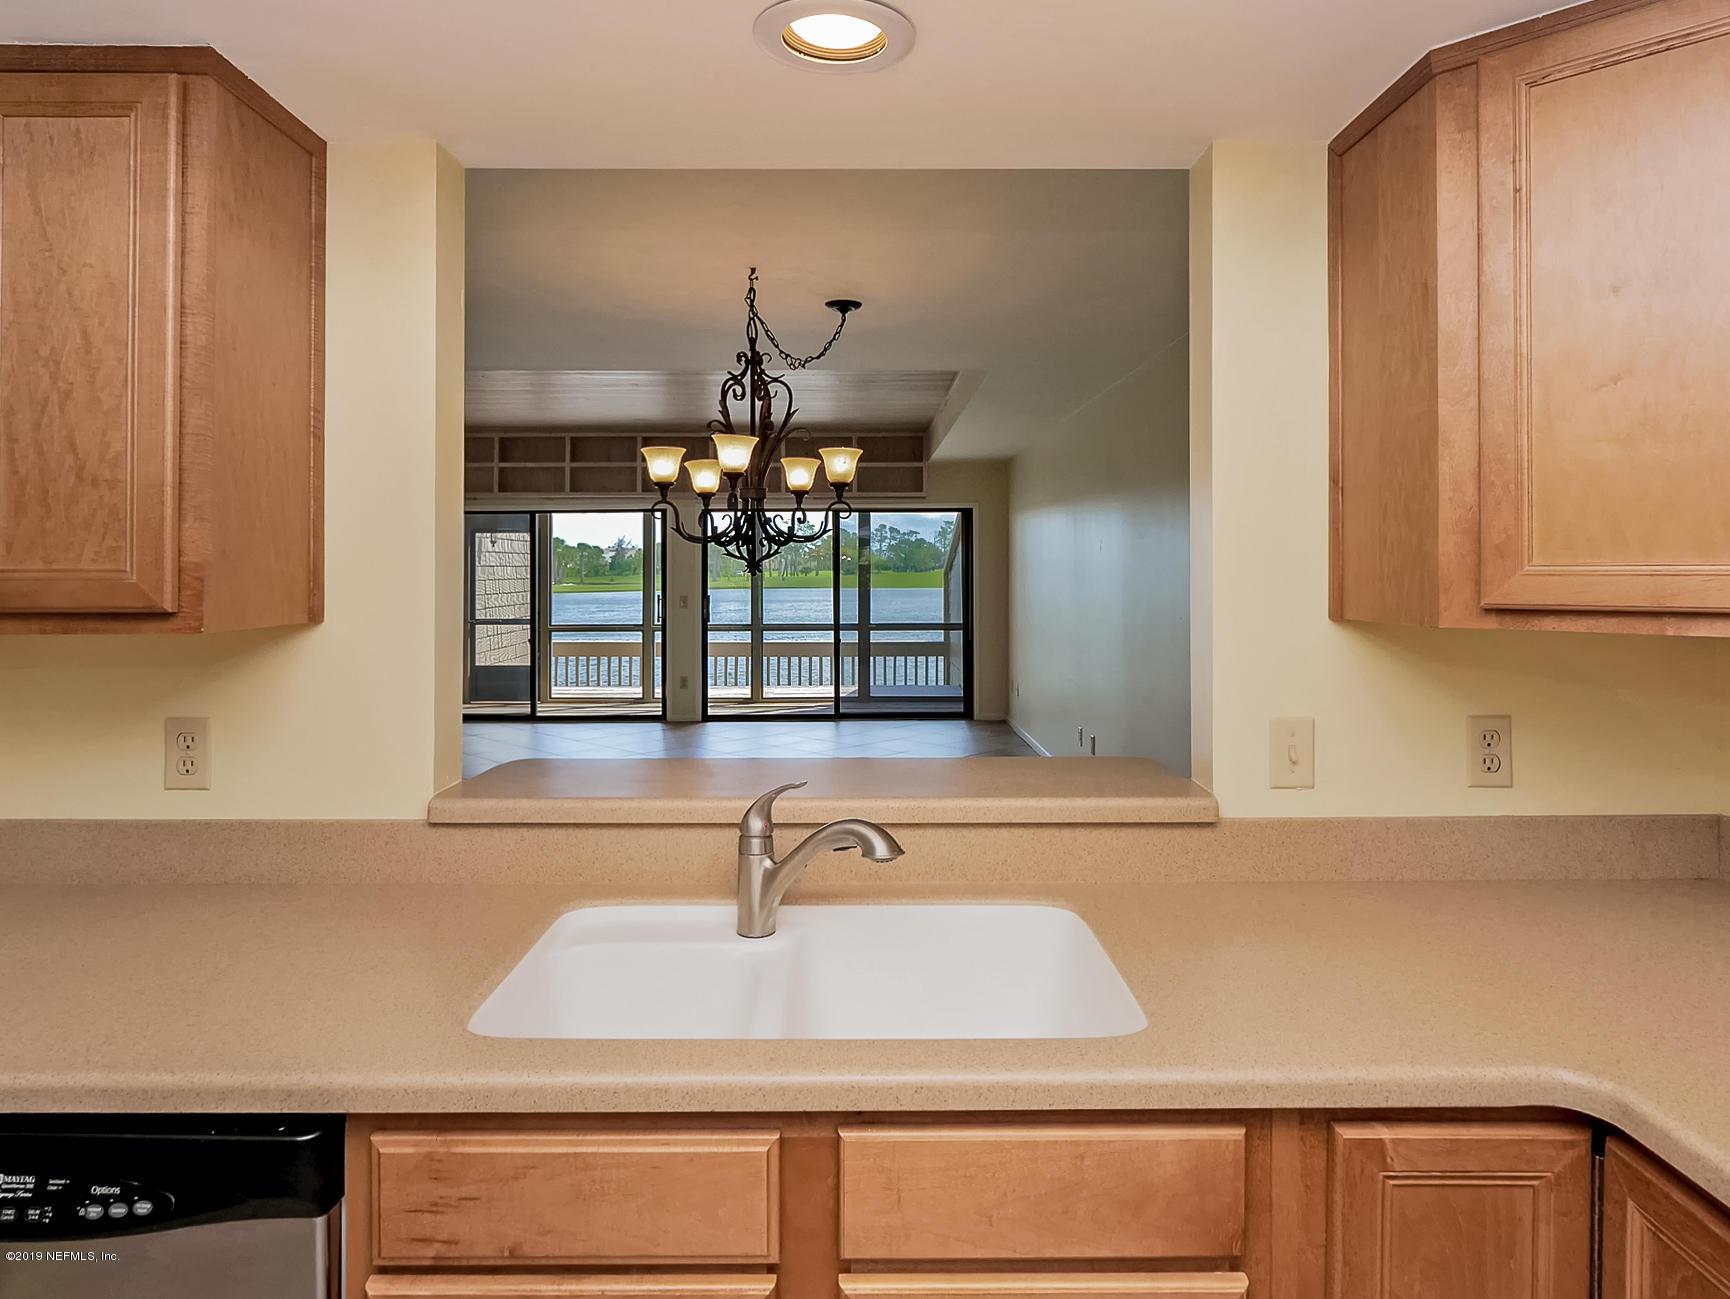 5 FISHERMANS COVE, PONTE VEDRA BEACH, FLORIDA 32082, 2 Bedrooms Bedrooms, ,2 BathroomsBathrooms,Condo,For sale,FISHERMANS COVE,1020269